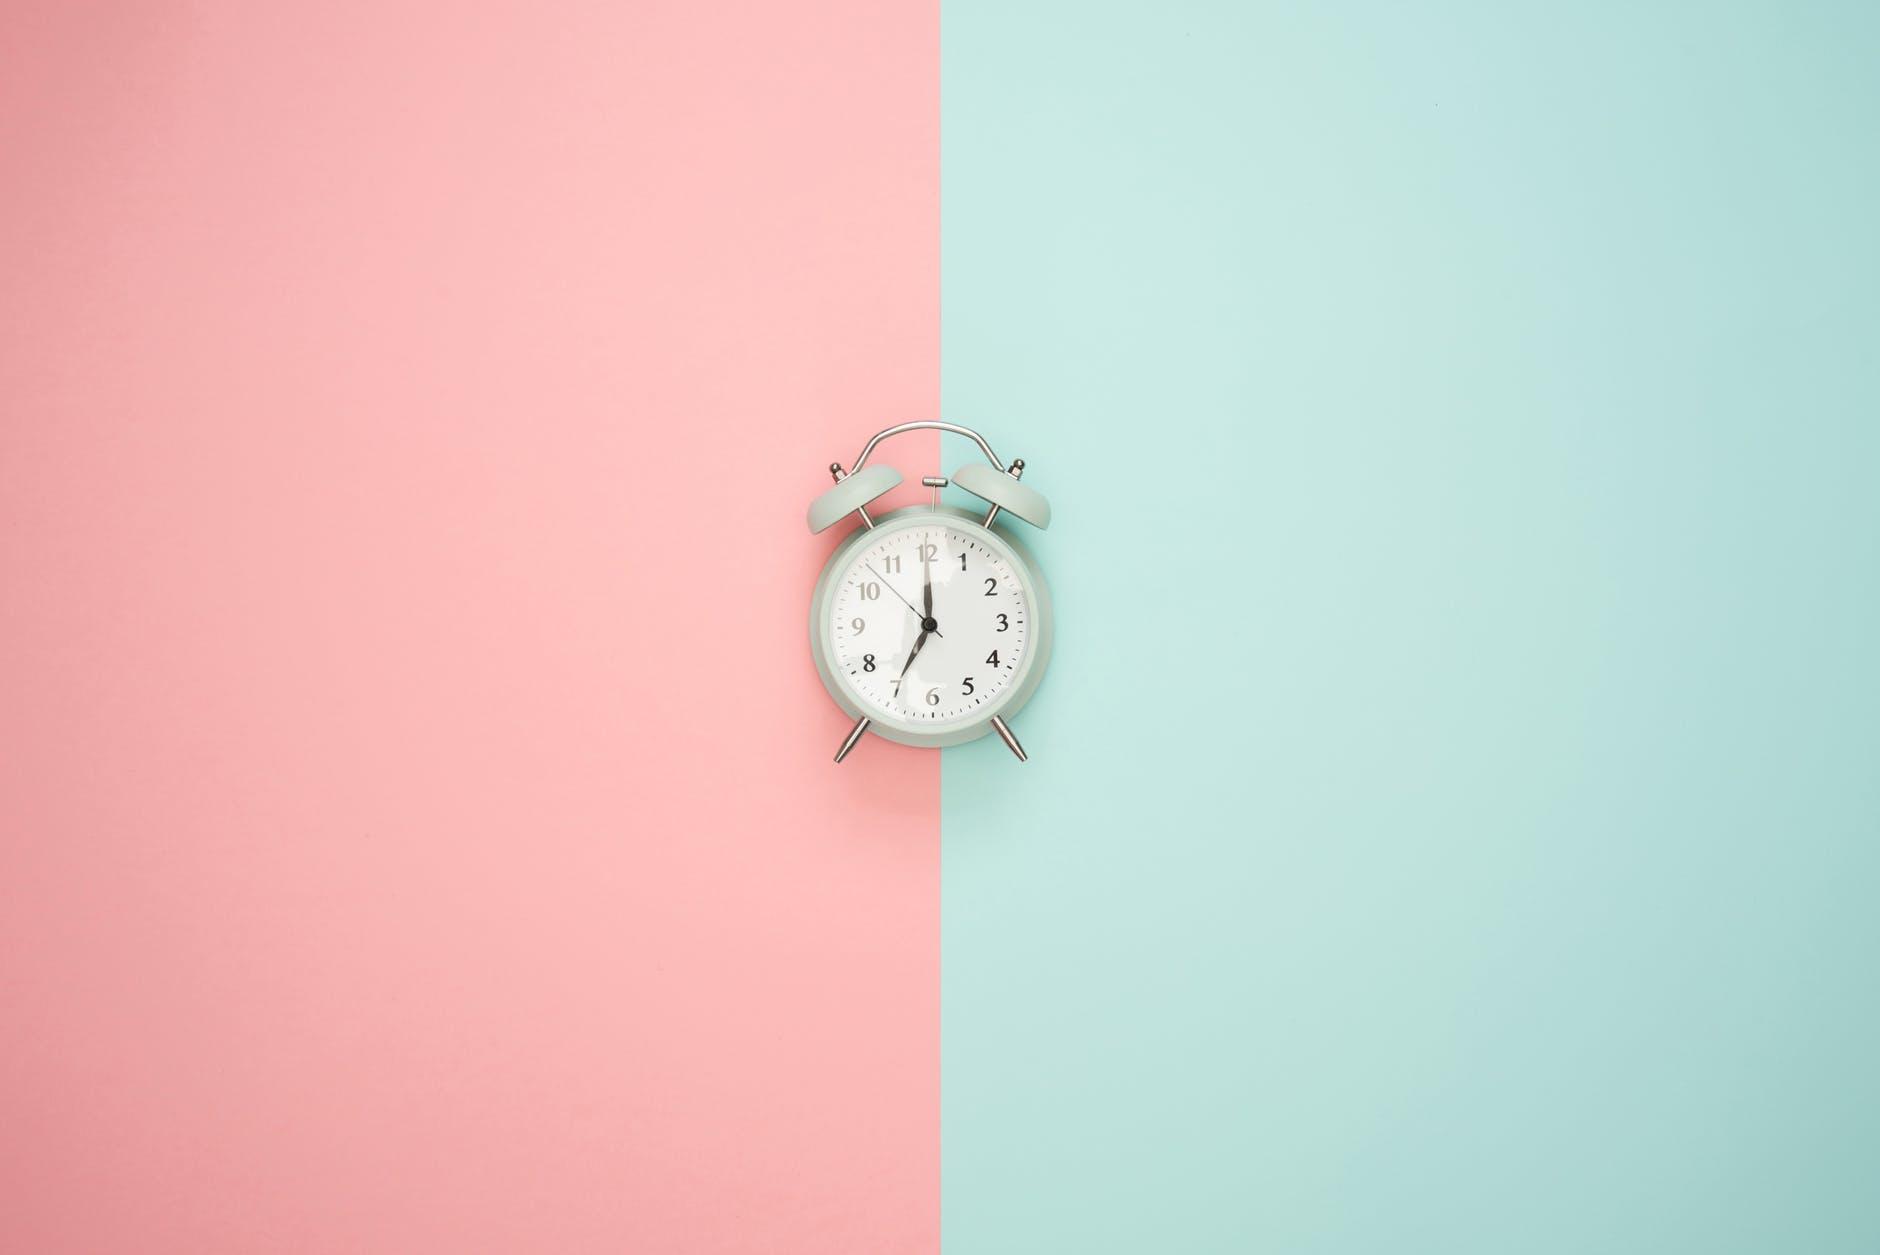 Jacqueline Govaert: 'Ik stil de tijd'